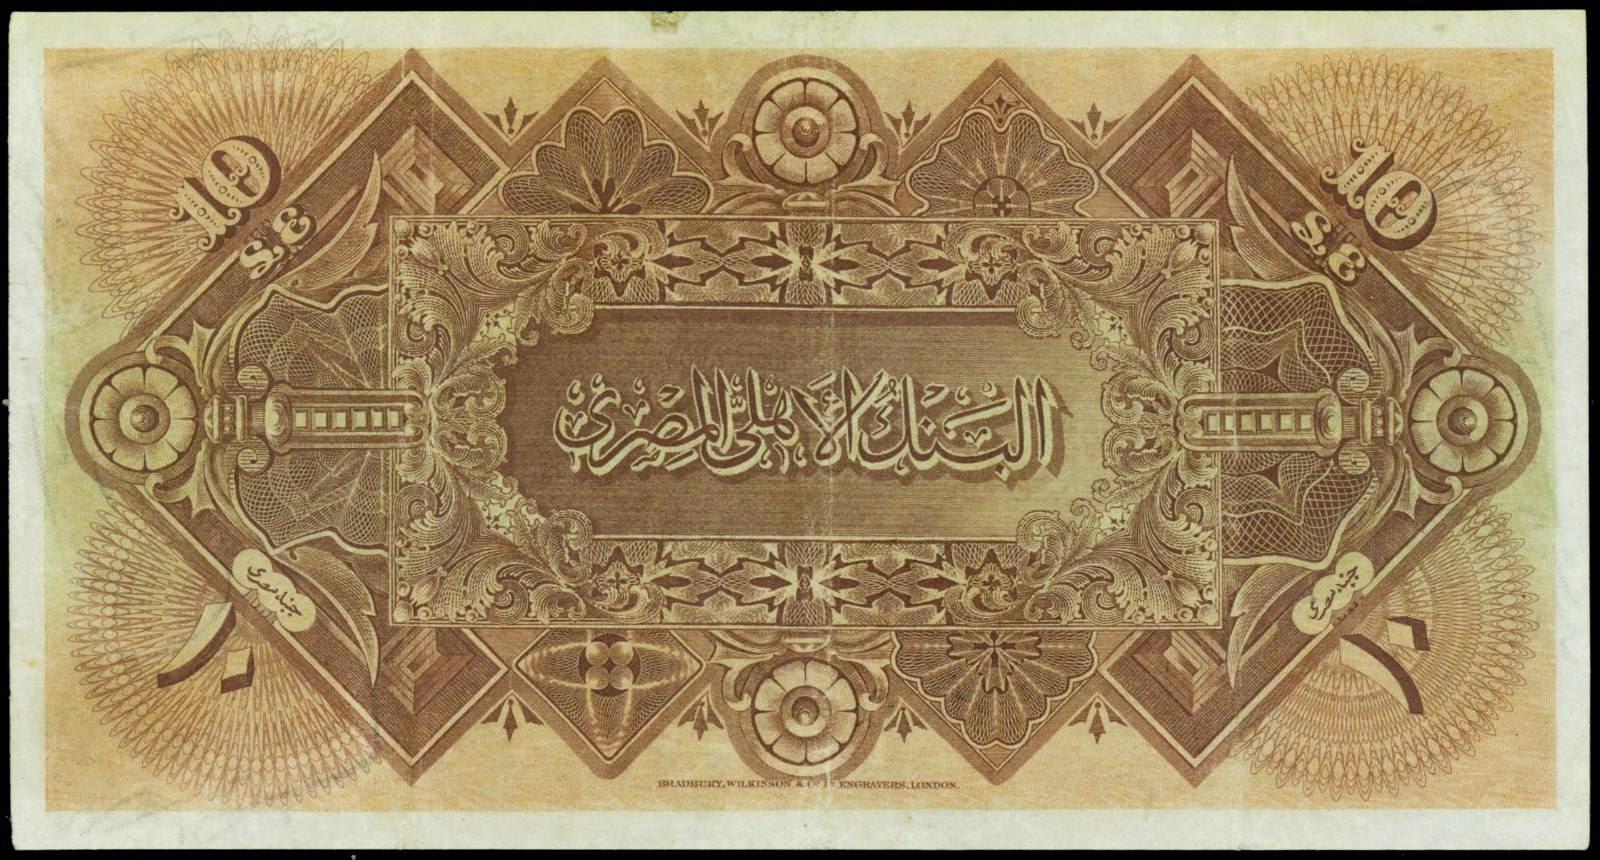 Egypt paper money 10 Pounds 1916 National Bank of Egypt